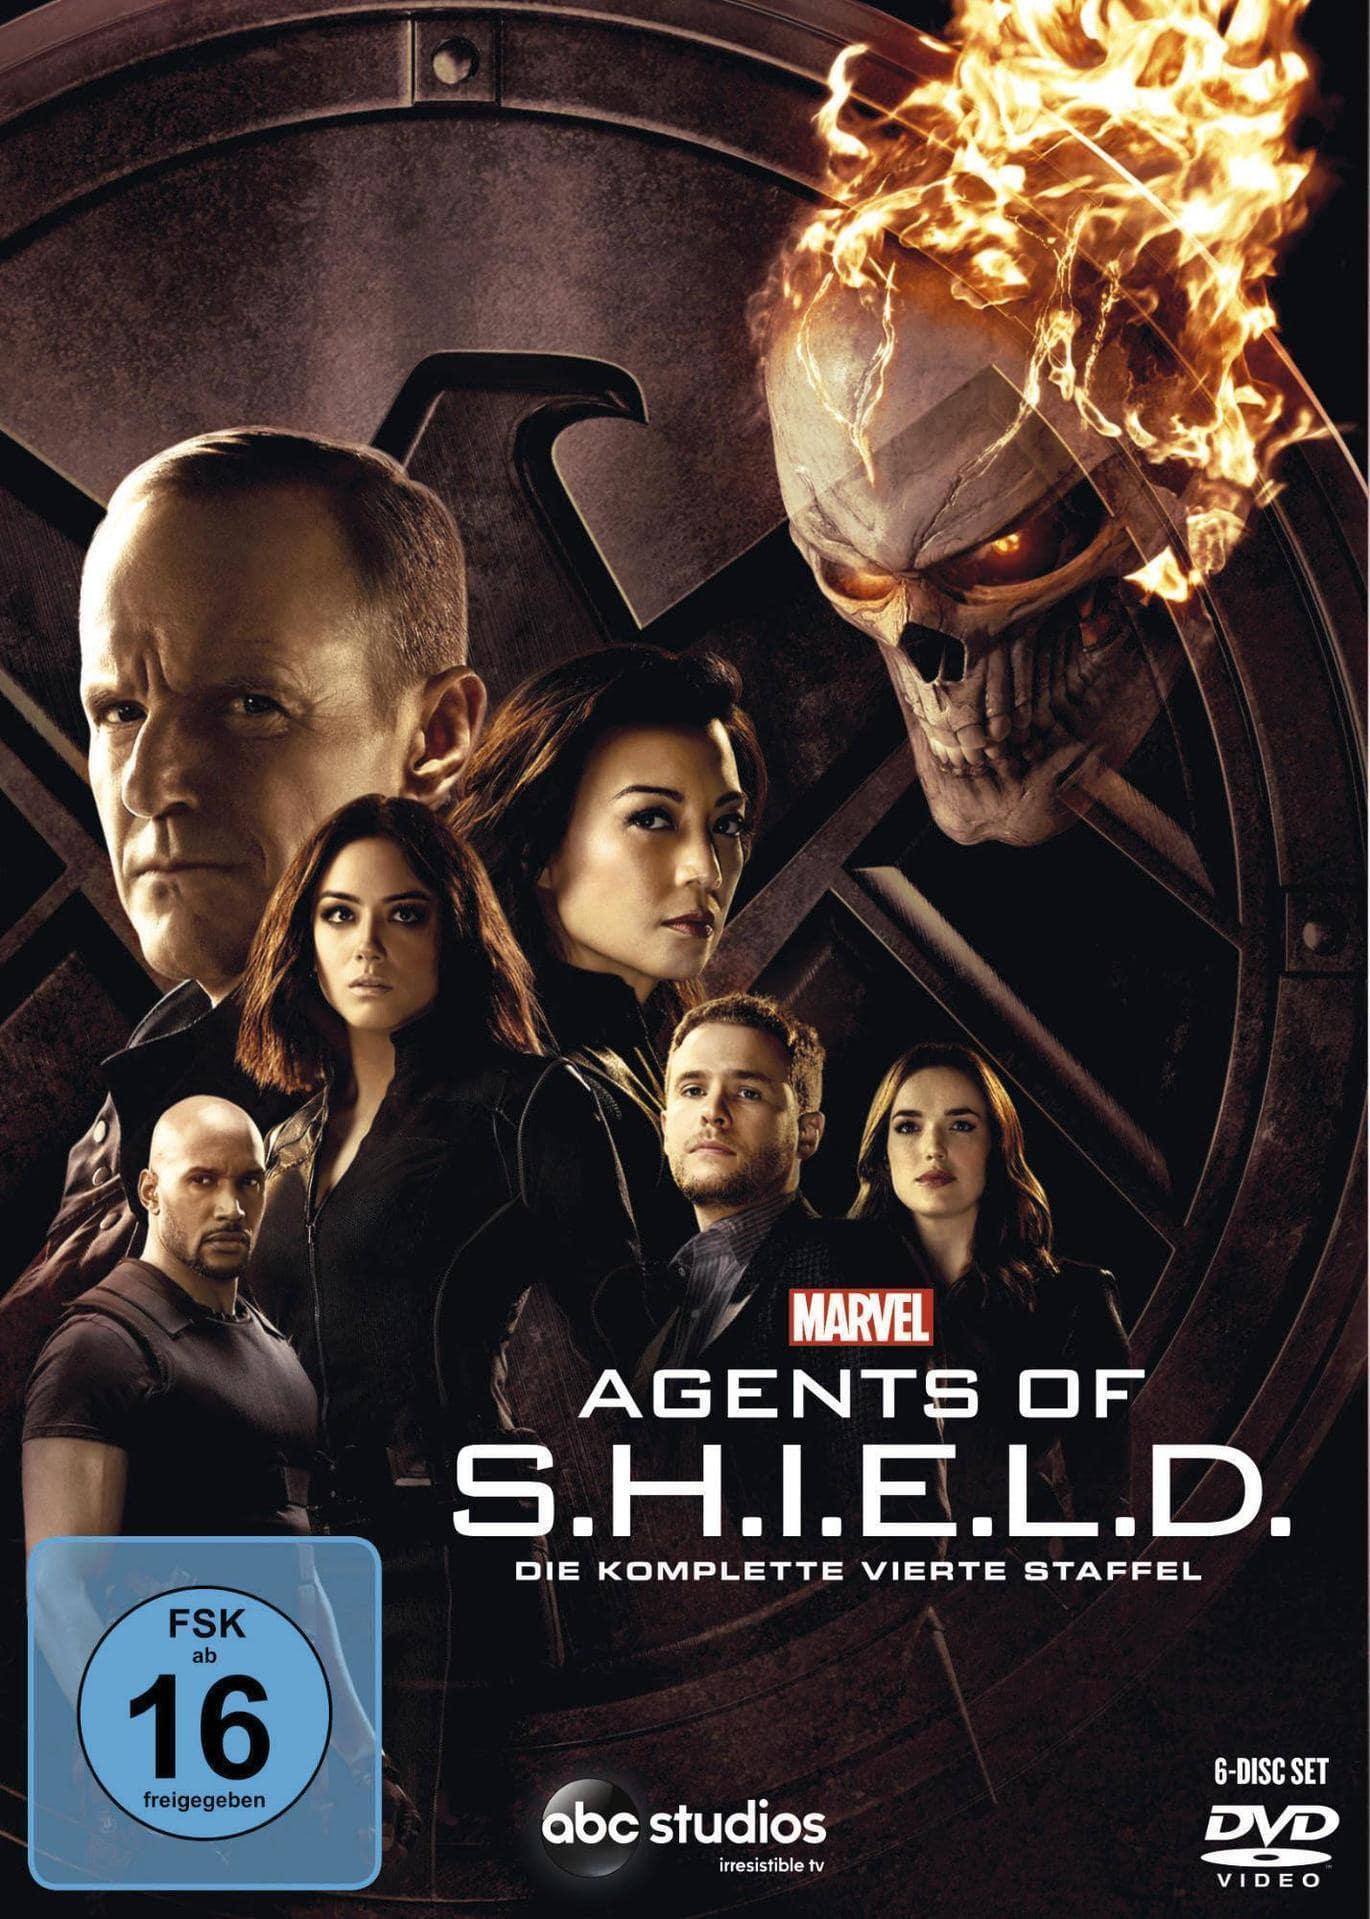 Marvel´s Agents Of S.H.I.E.L.D. - Staffel 4 (DVD) für 35,99 Euro